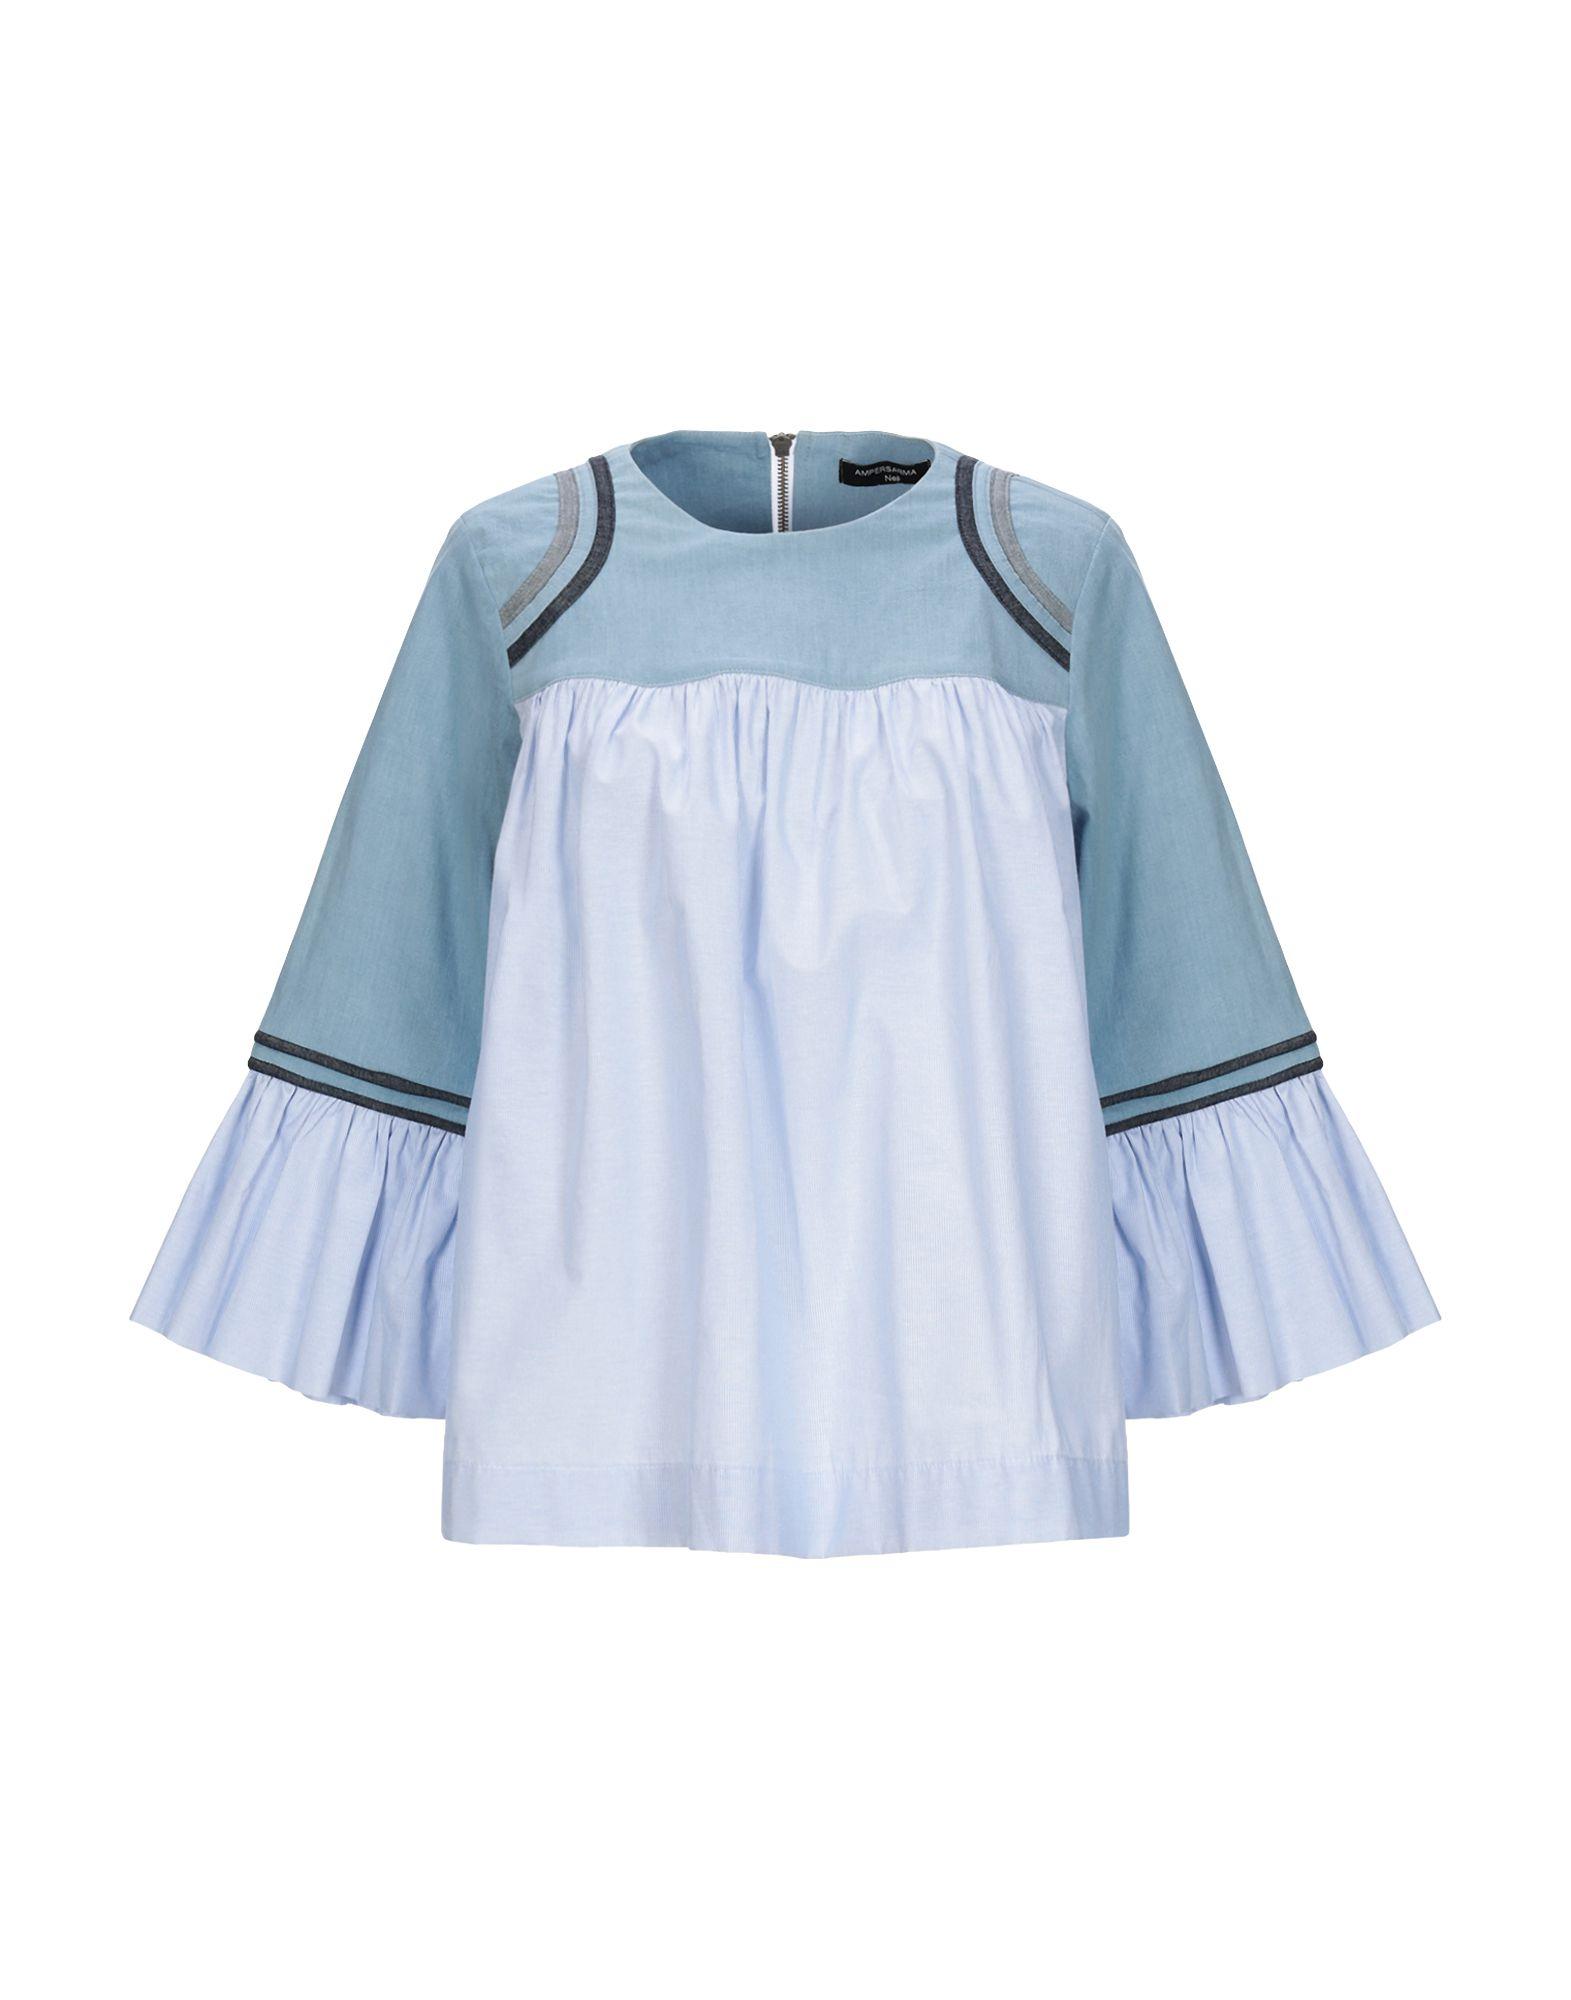 AMPERSAND HEART New York Блузка ampersand heart new york джинсовая юбка